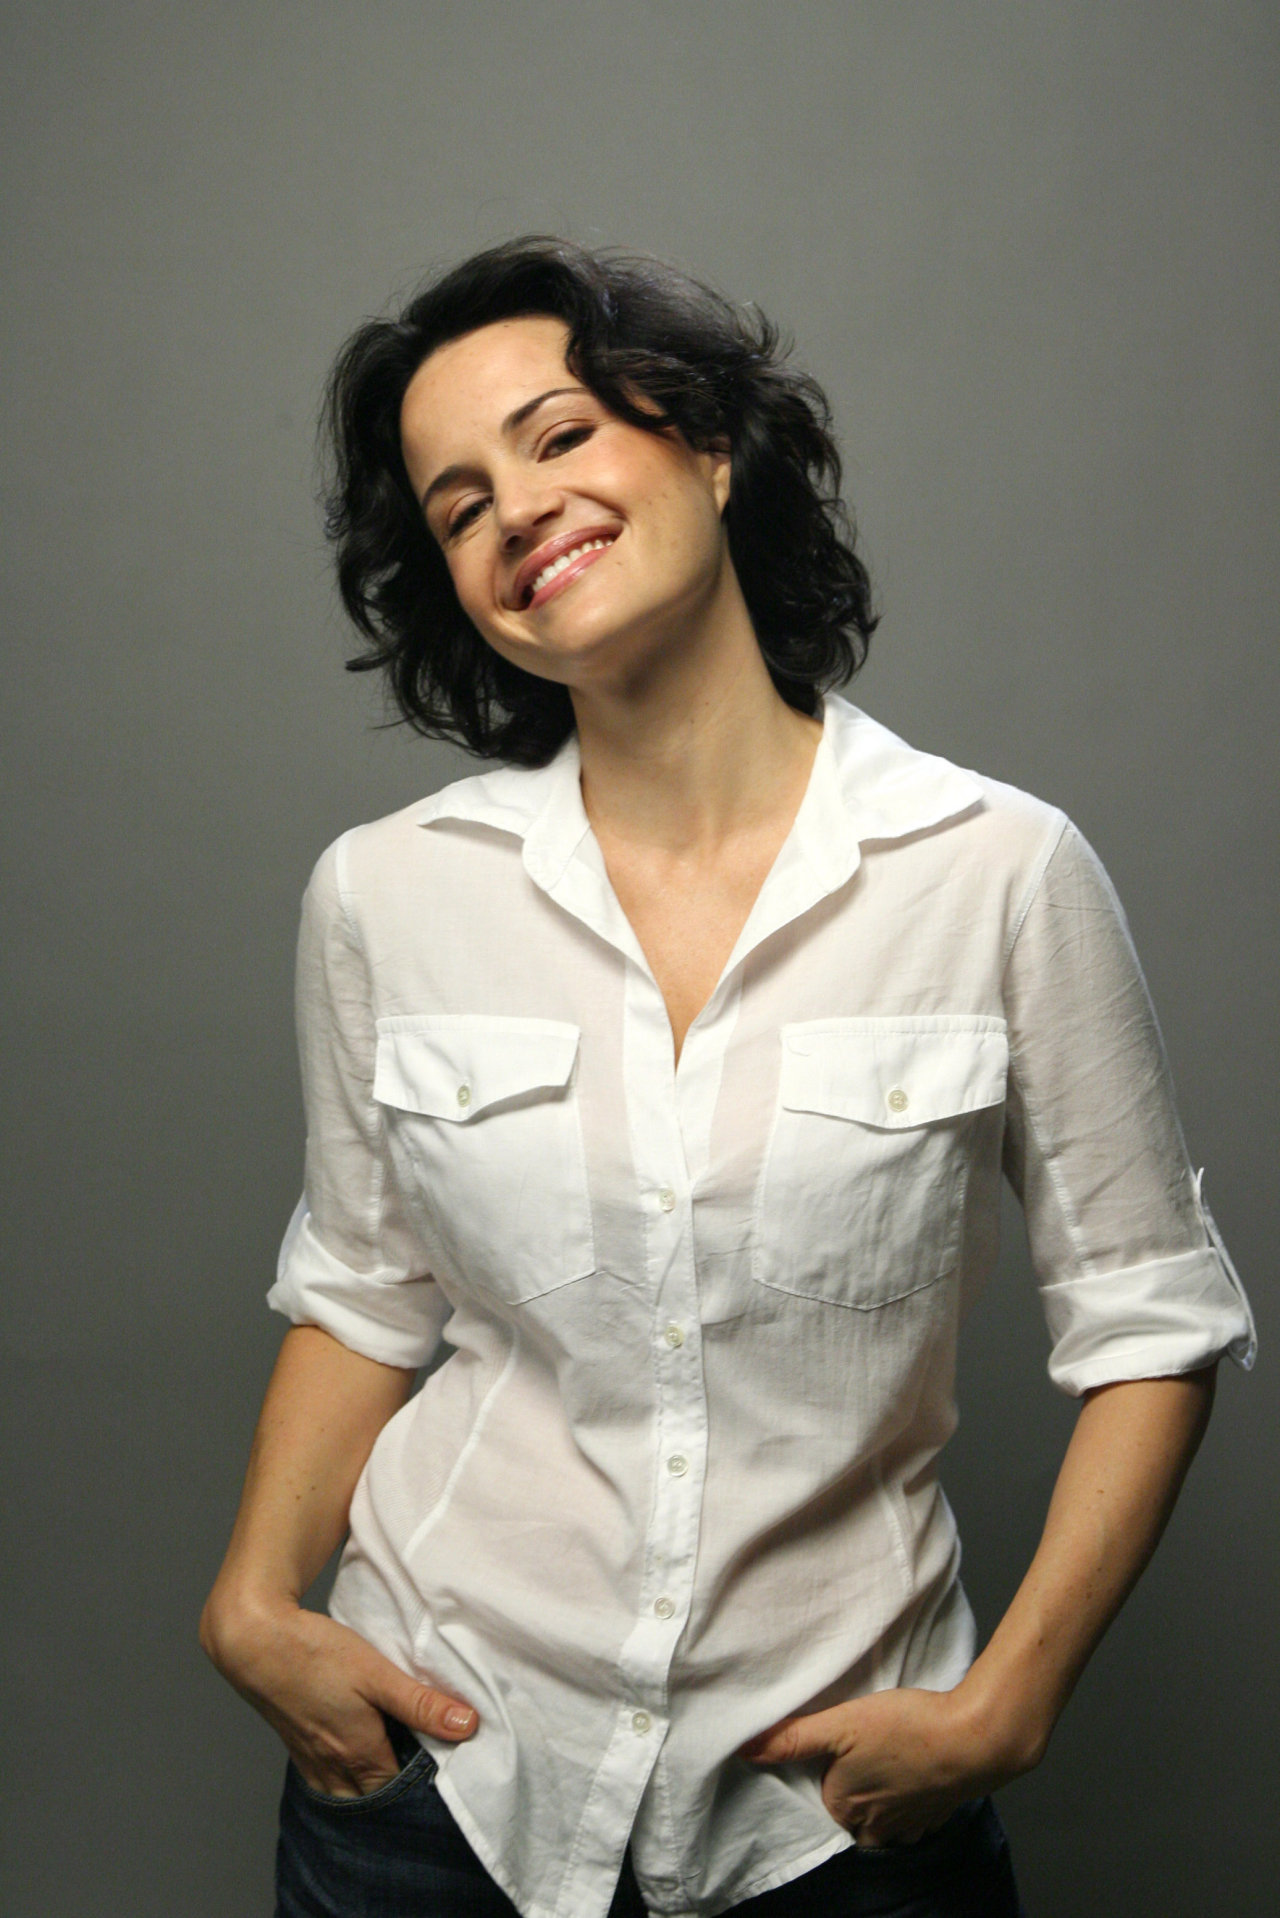 Carla Gugino Photo Shoot  SheClickcom